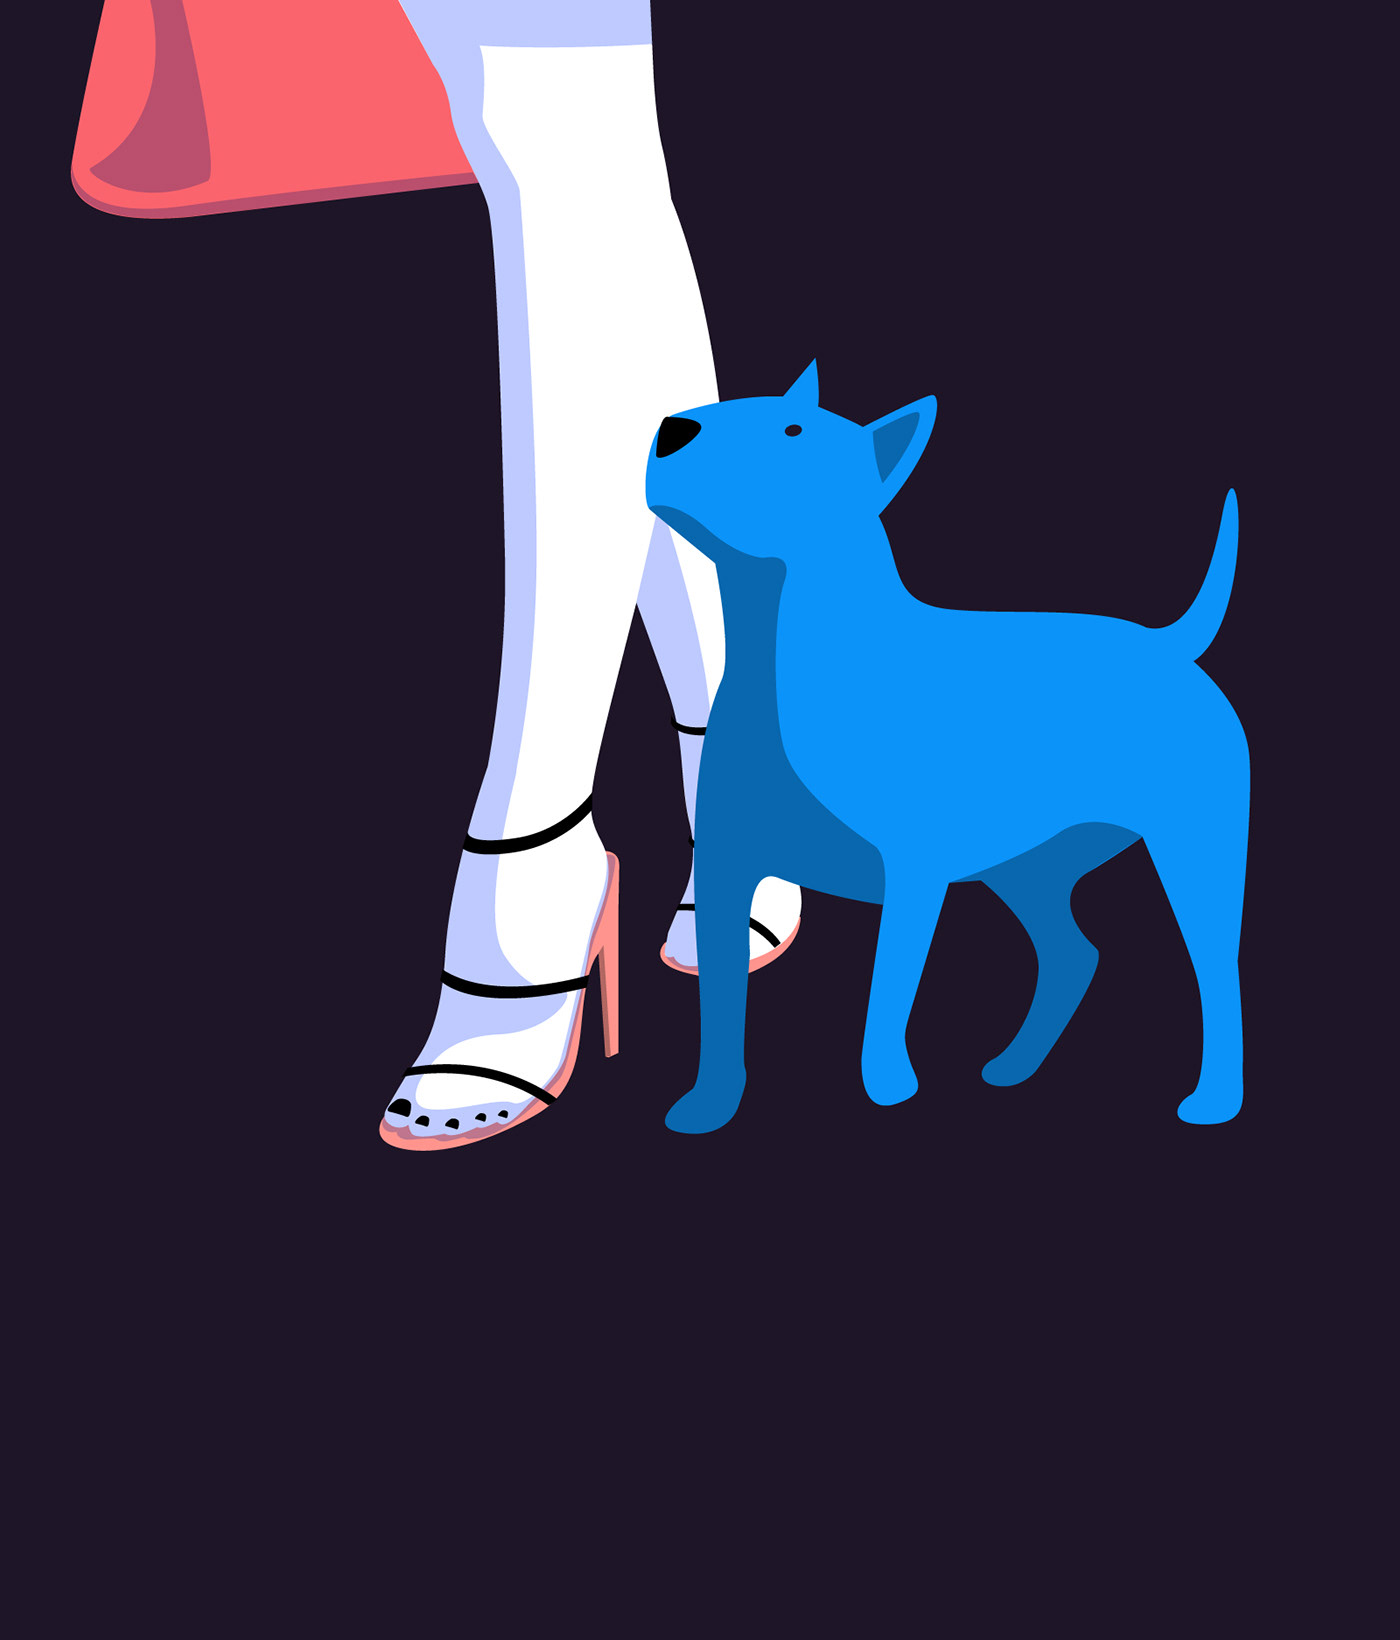 Image may contain: animal, cartoon and dog